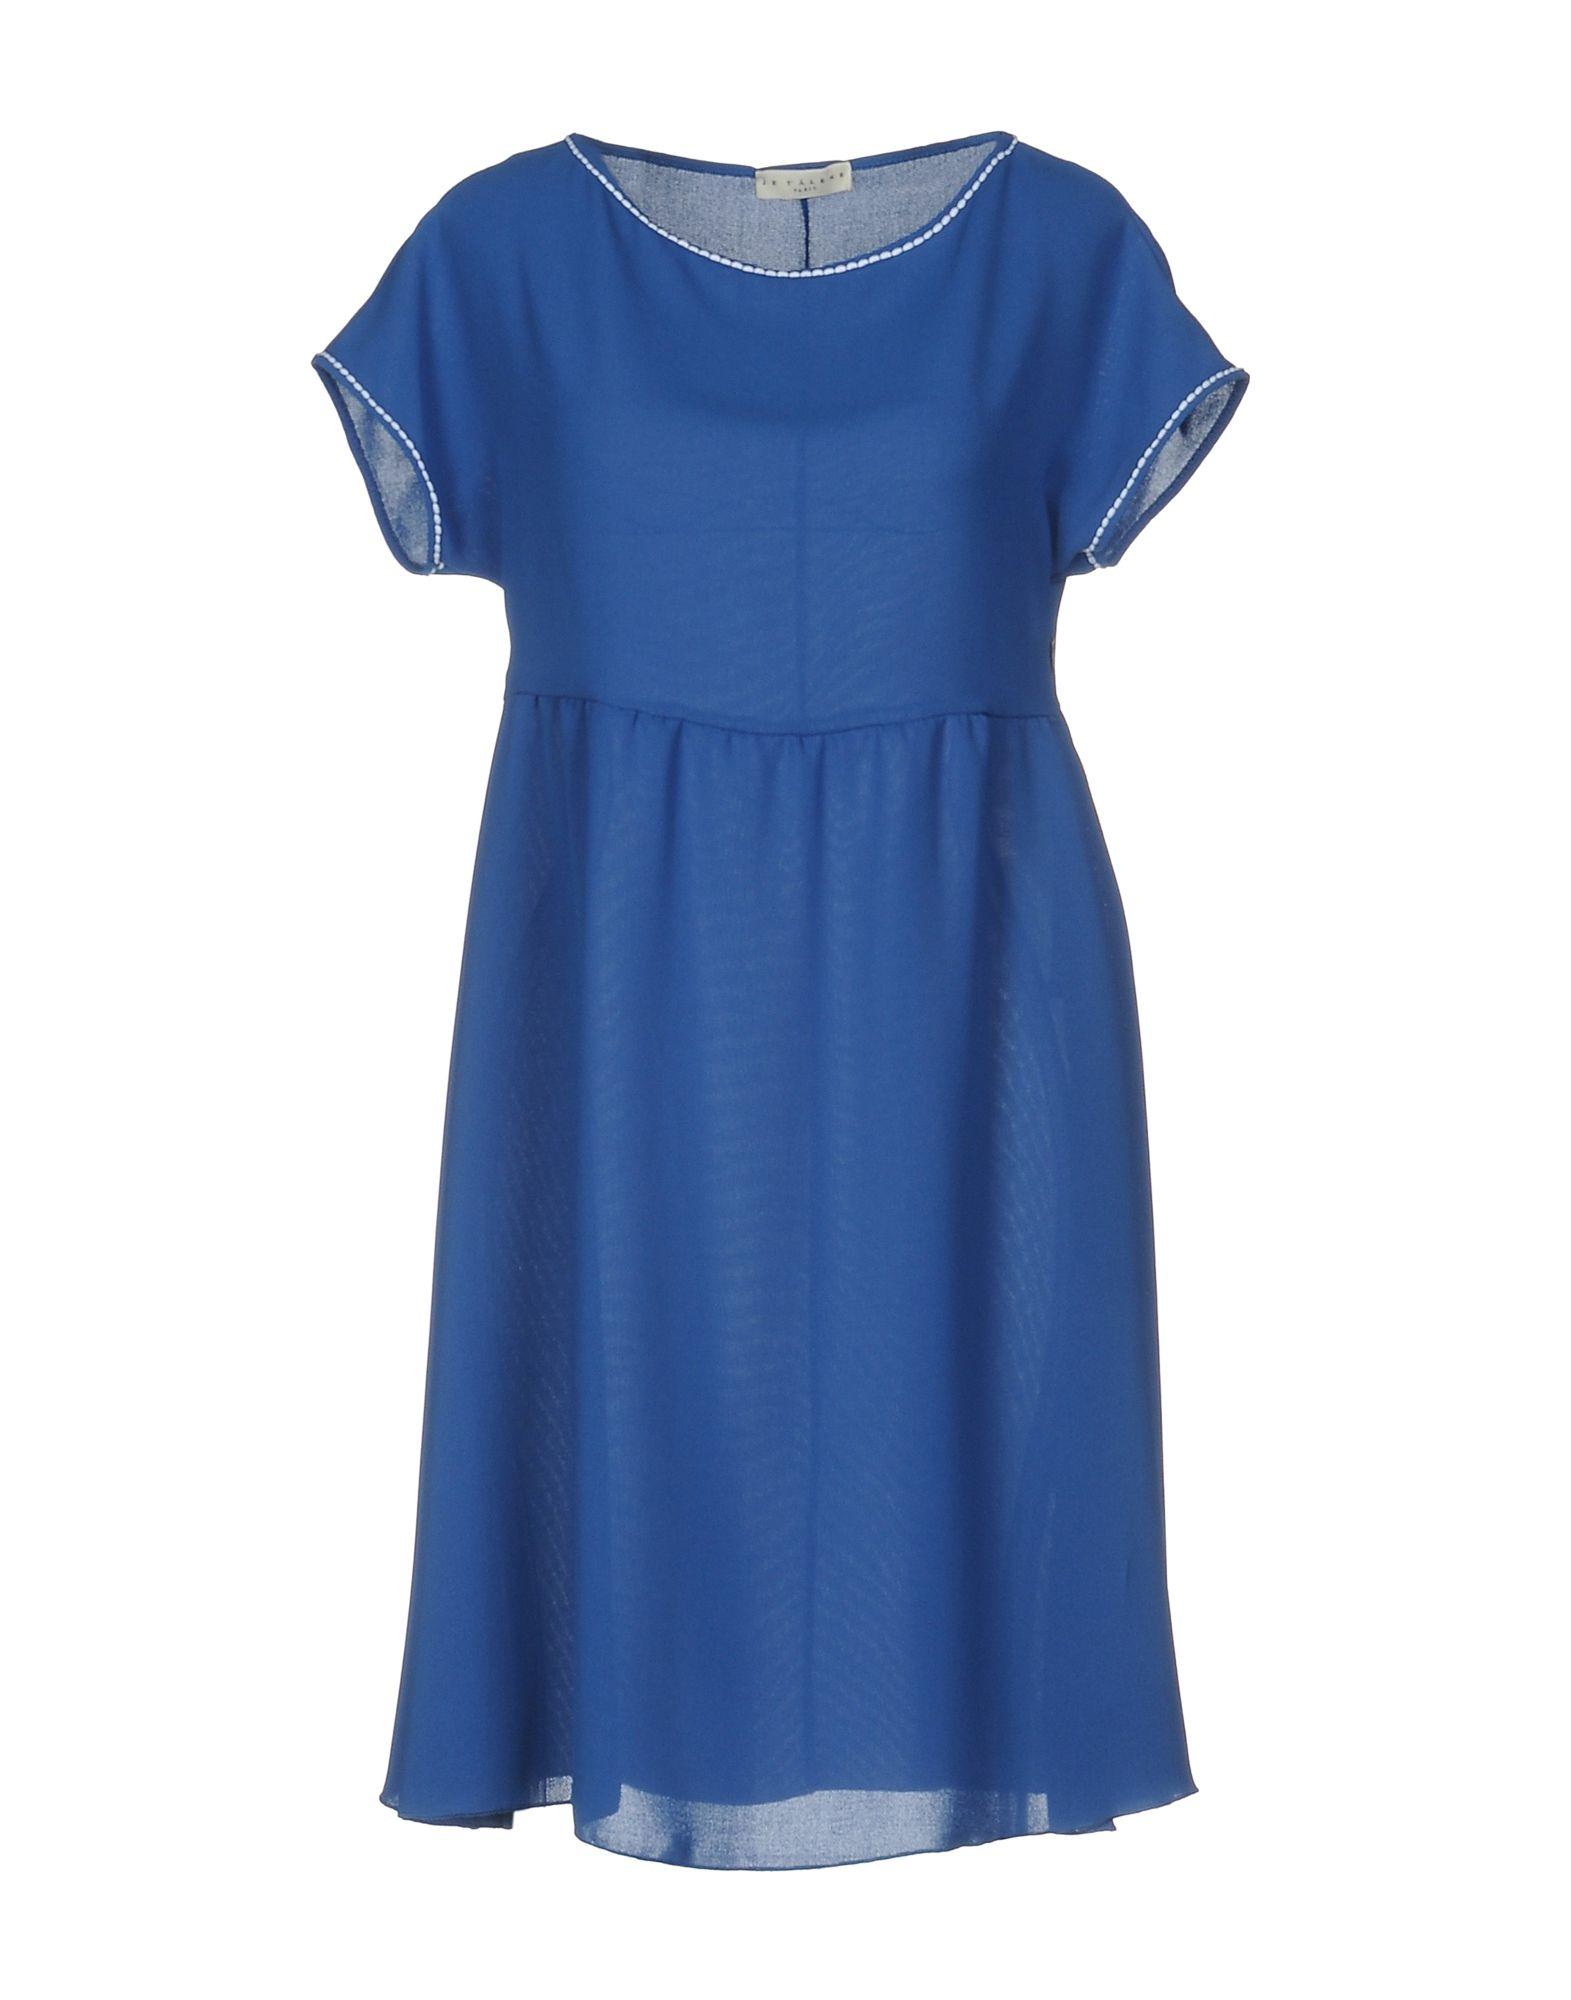 ã°â¿ã°â¾ã°â´ã°â²ã°âµã±âã°â½ã°â°ã±â ã° ã±âŽã±âã±â'ã±â€ã°â° favourite cockle 1302 6p JT'  JE T' ÂLENE Короткое платье